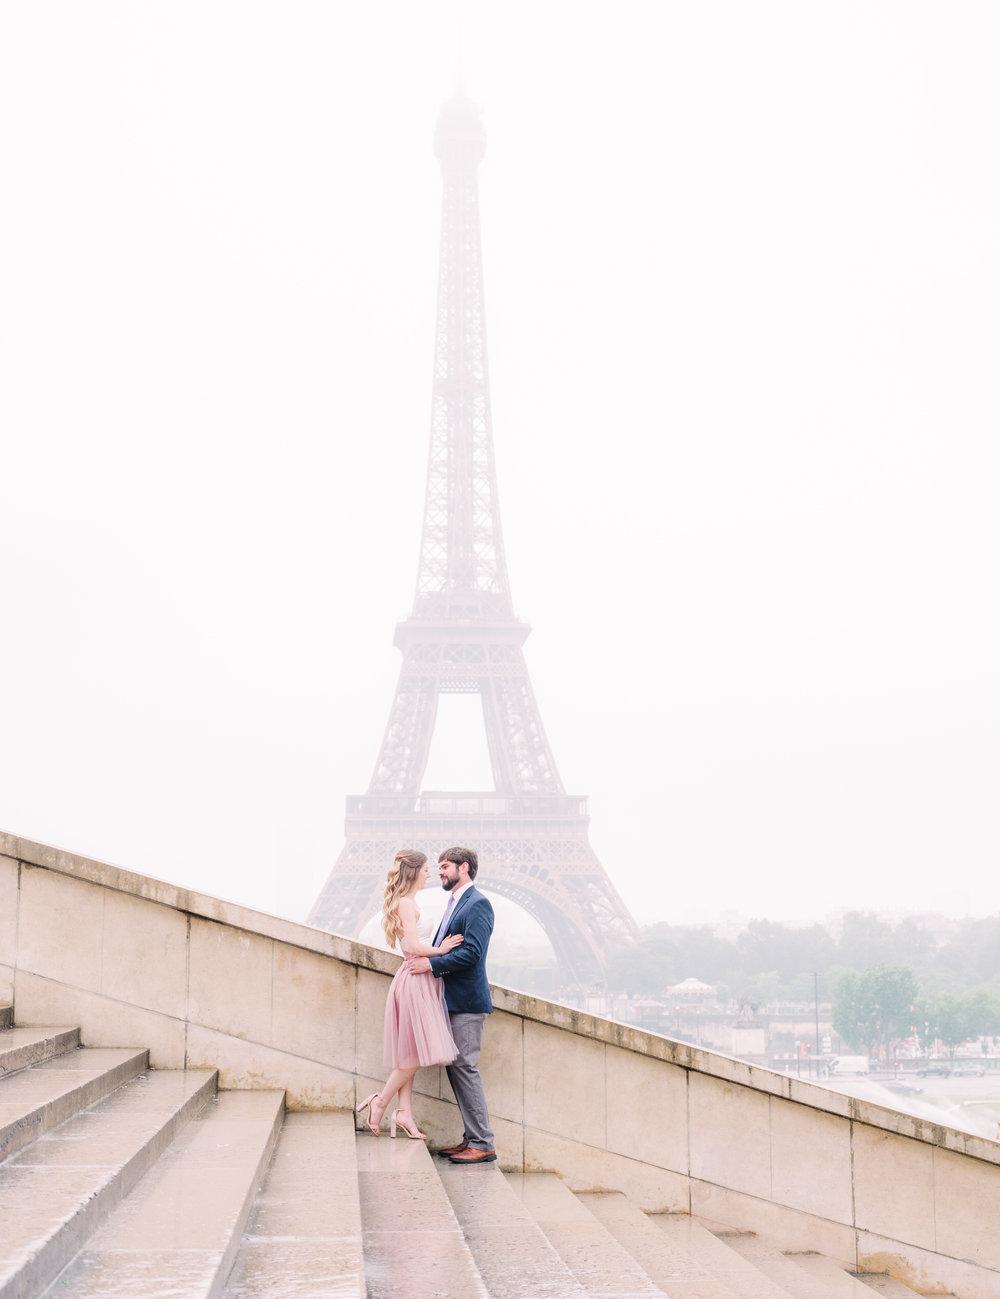 Dreamy, romantic Paris photo shoot at the Eiffel Tower in the rain -